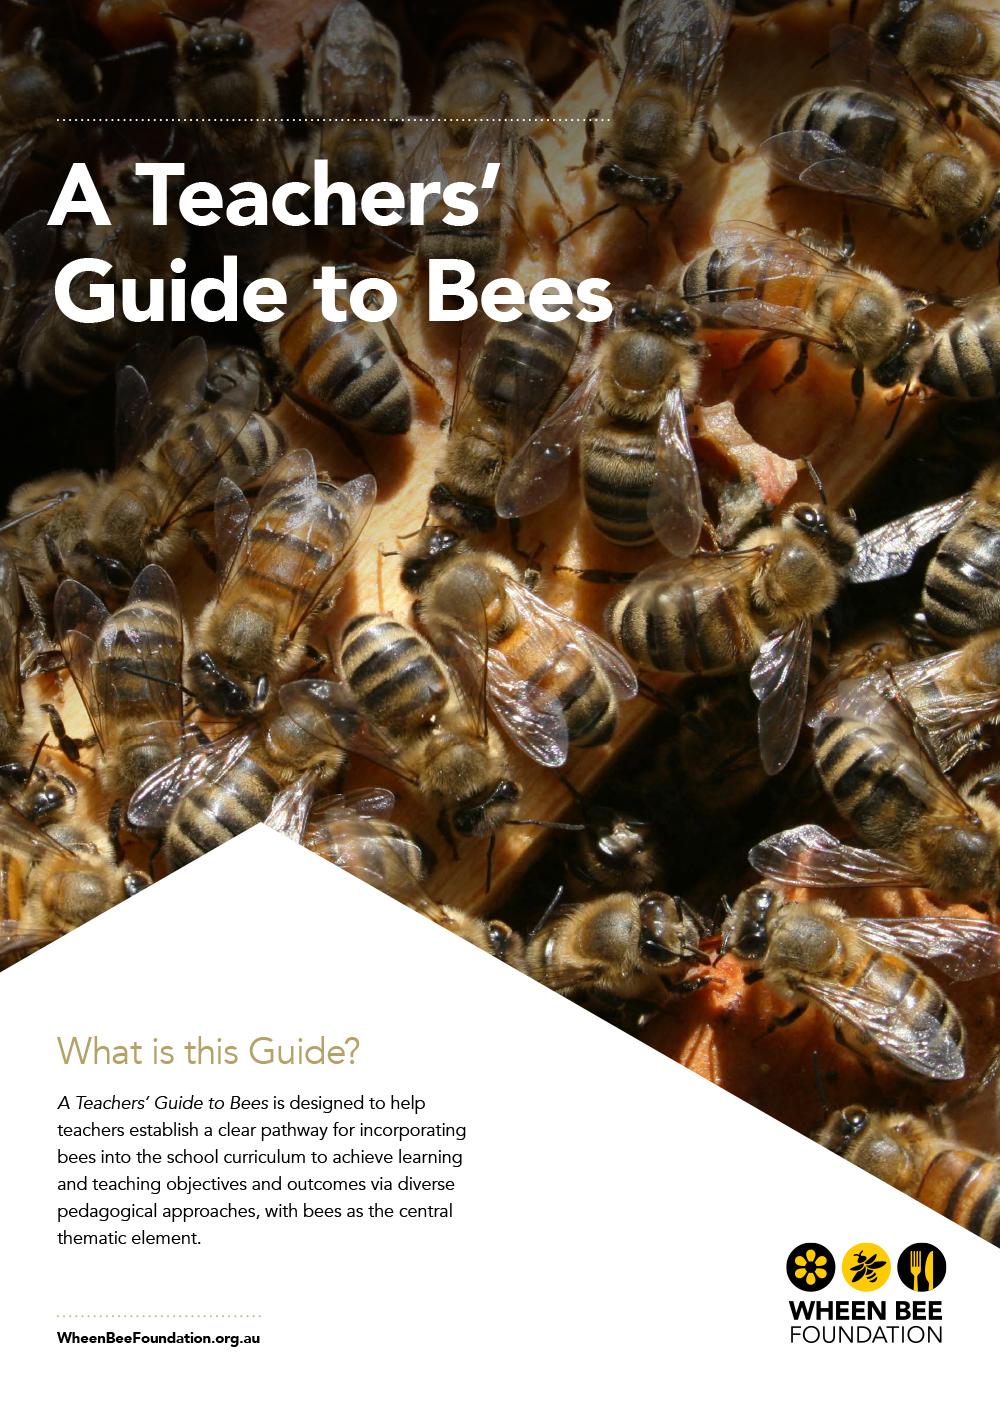 saaa_teachers_guide_to-bees)